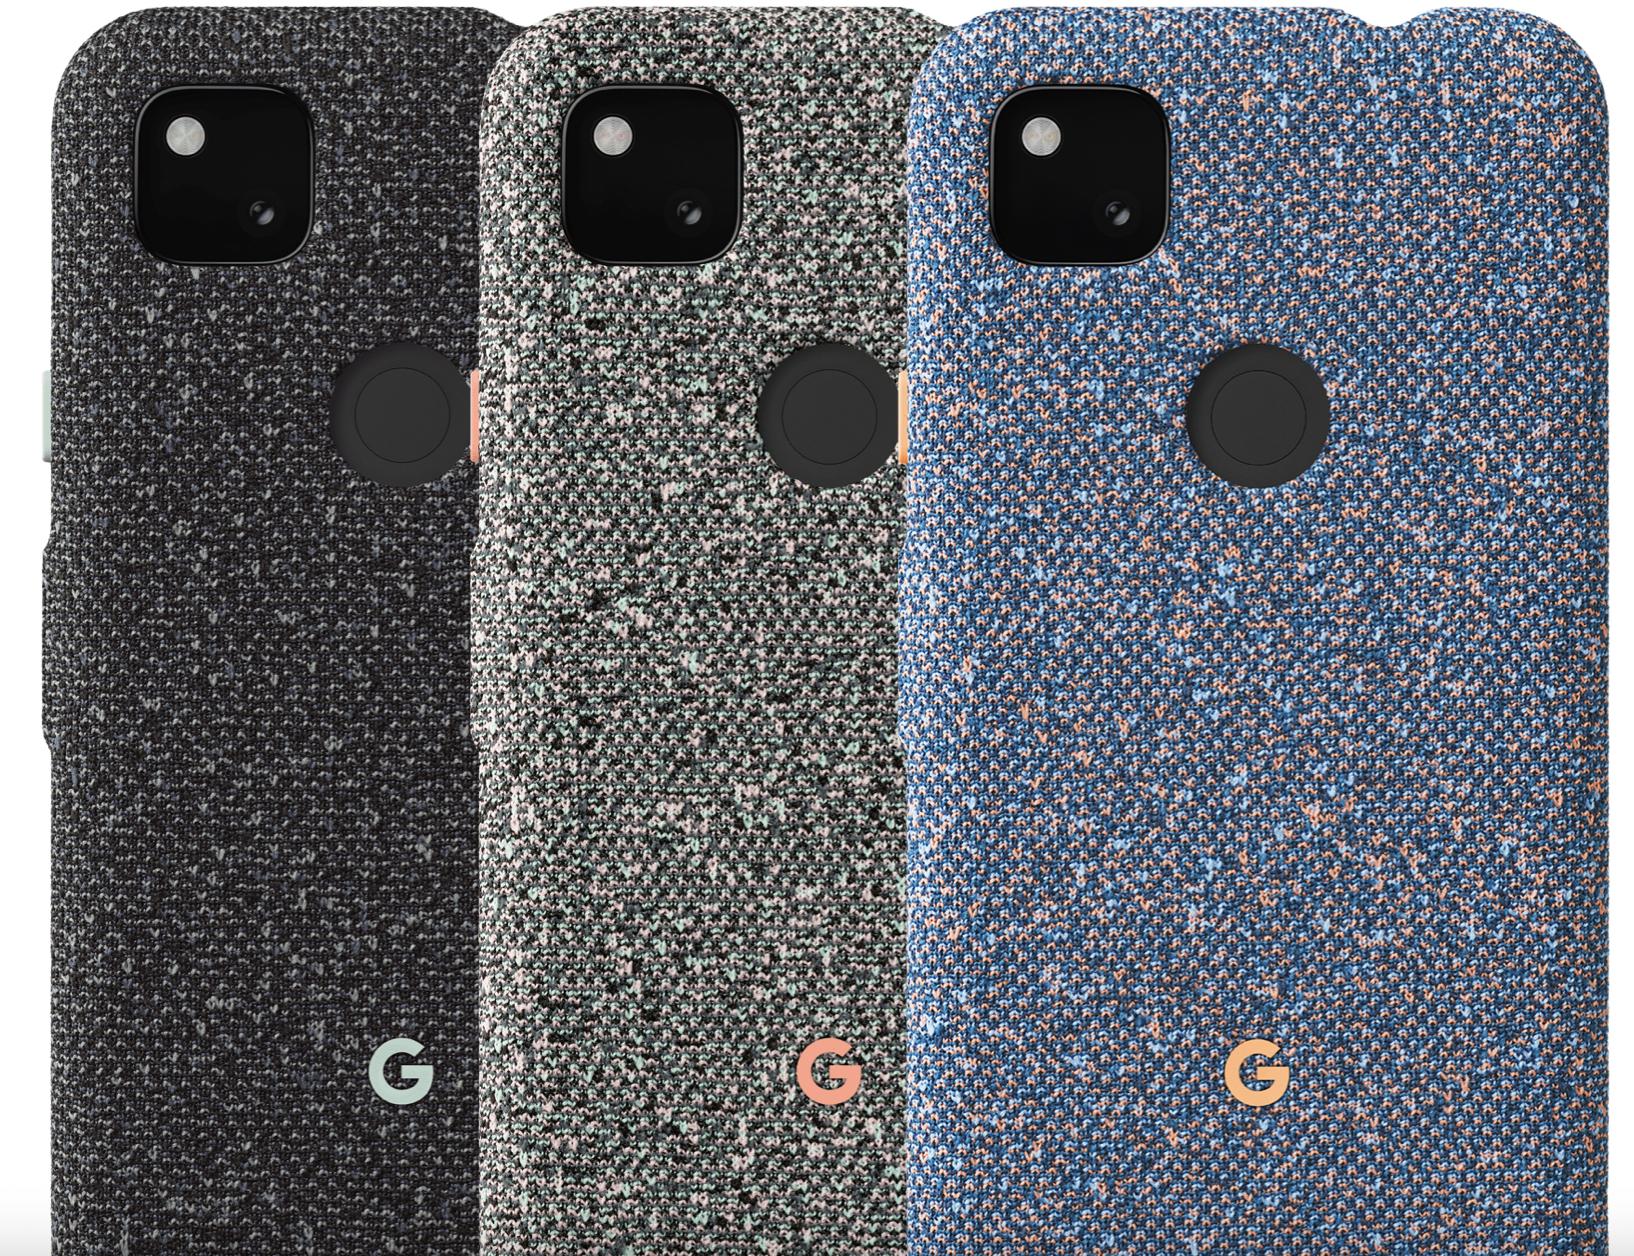 Google pixel 4a genuine fabric case - £17.50 @ Google Store